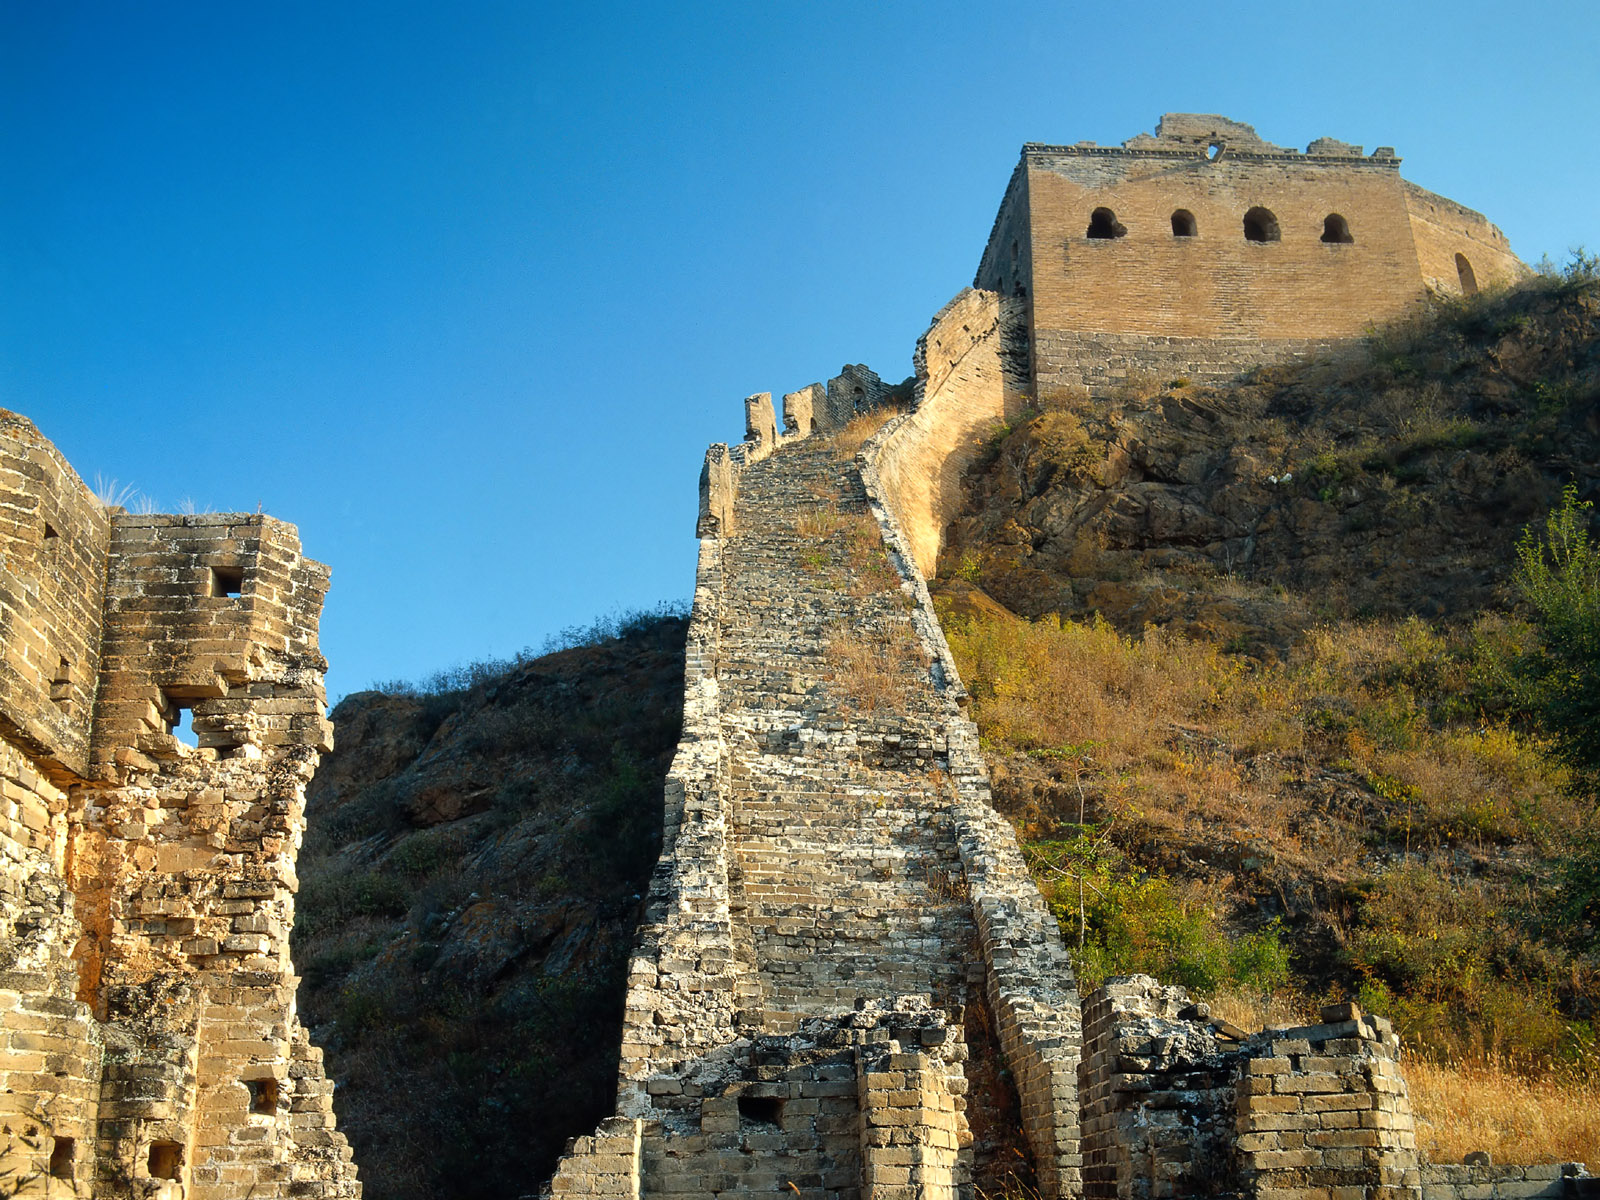 http://3.bp.blogspot.com/_tCDMn4HPxqQ/S--fTGftW-I/AAAAAAAAABk/kiamCd-Vt_g/s1600/Great+Wall+%2816%29.jpg